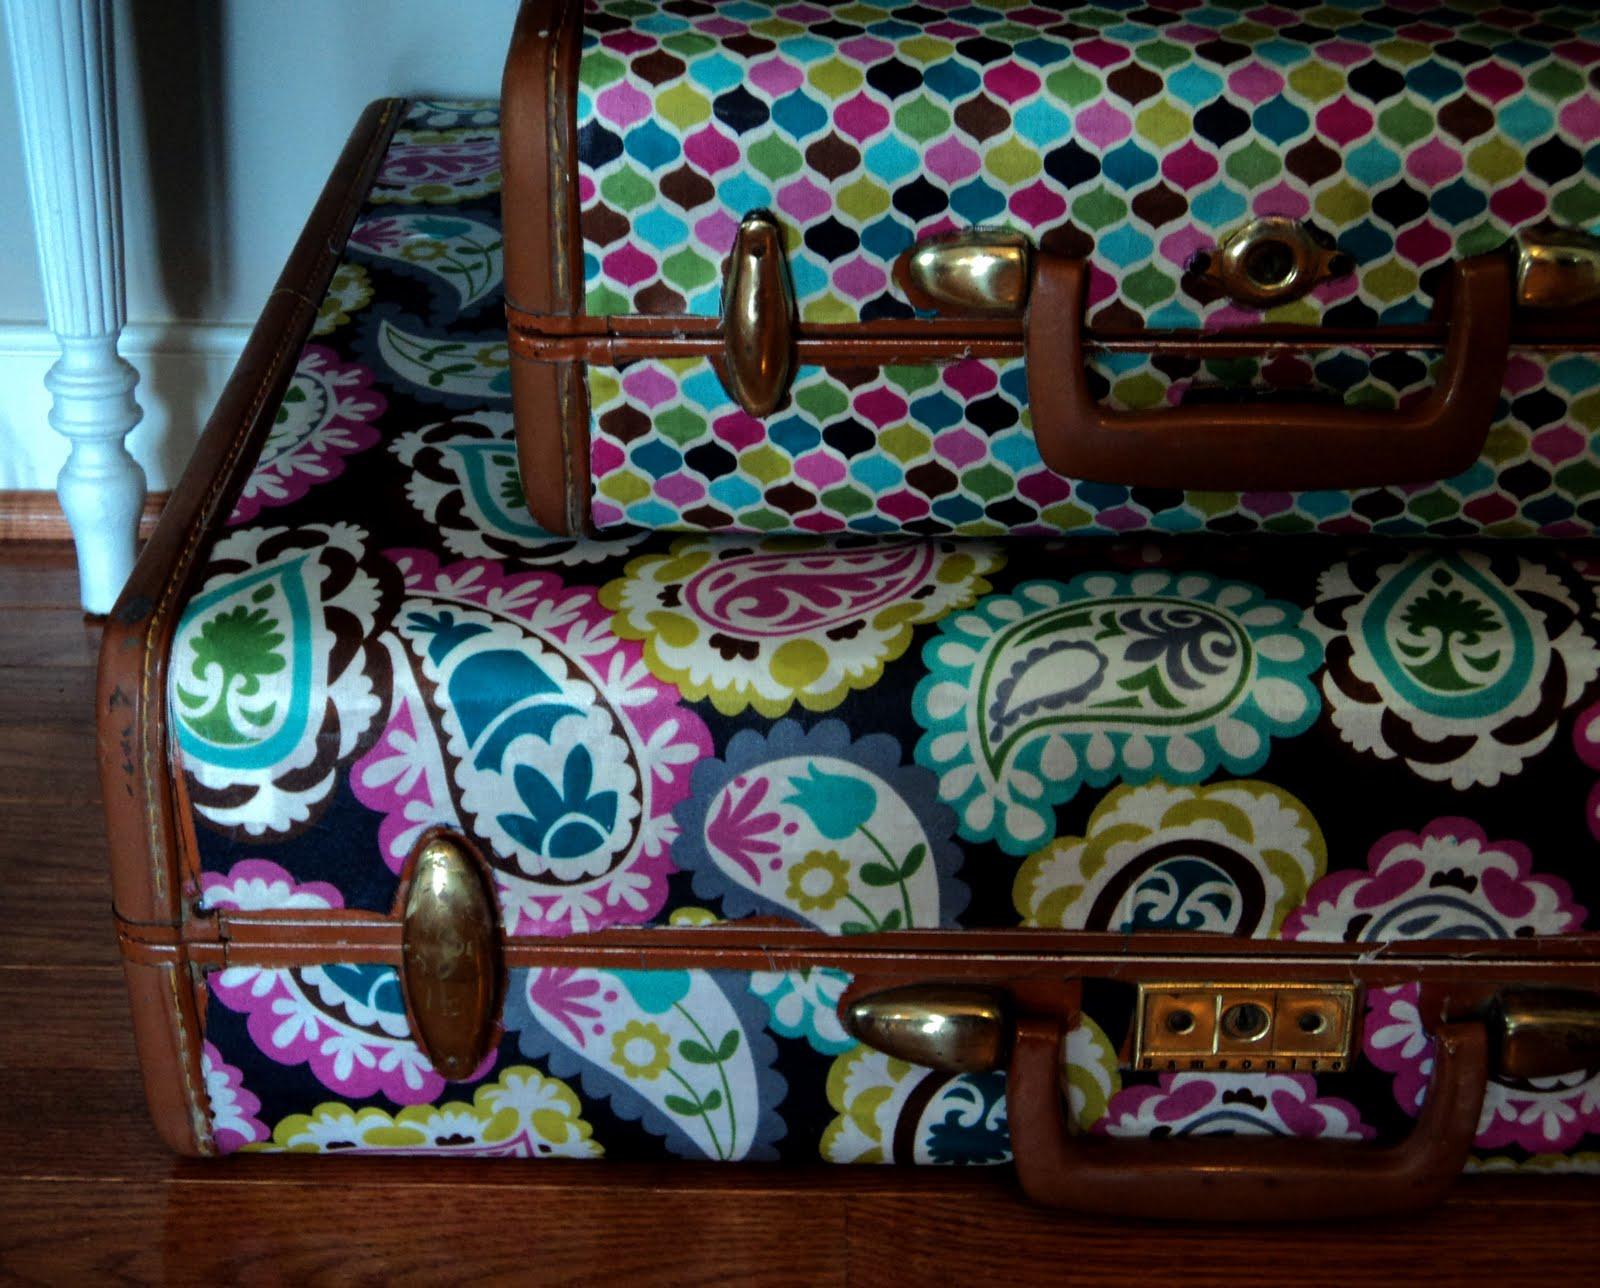 http://3.bp.blogspot.com/-Xn6k5tlVsg4/TamY91t-GVI/AAAAAAAAAU8/KdWQ5xL_Ysk/s1600/suitcases.jpg